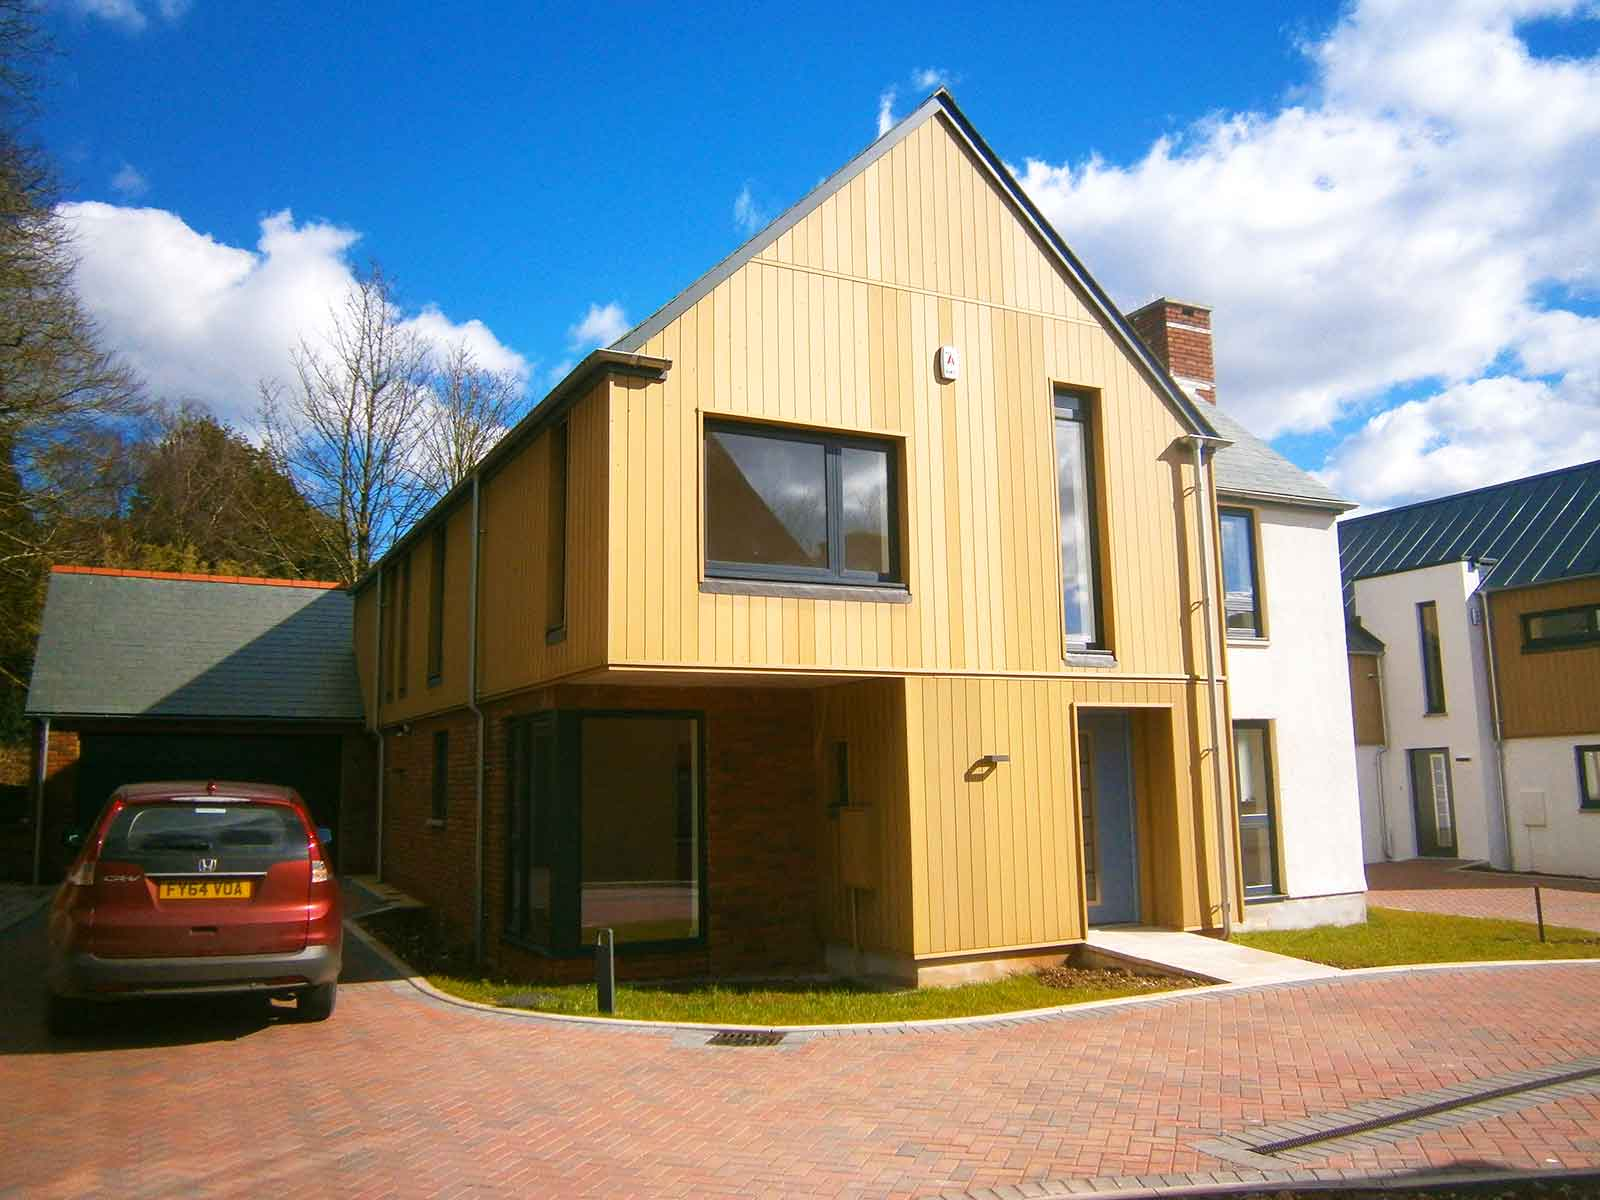 New homes built in Totnes